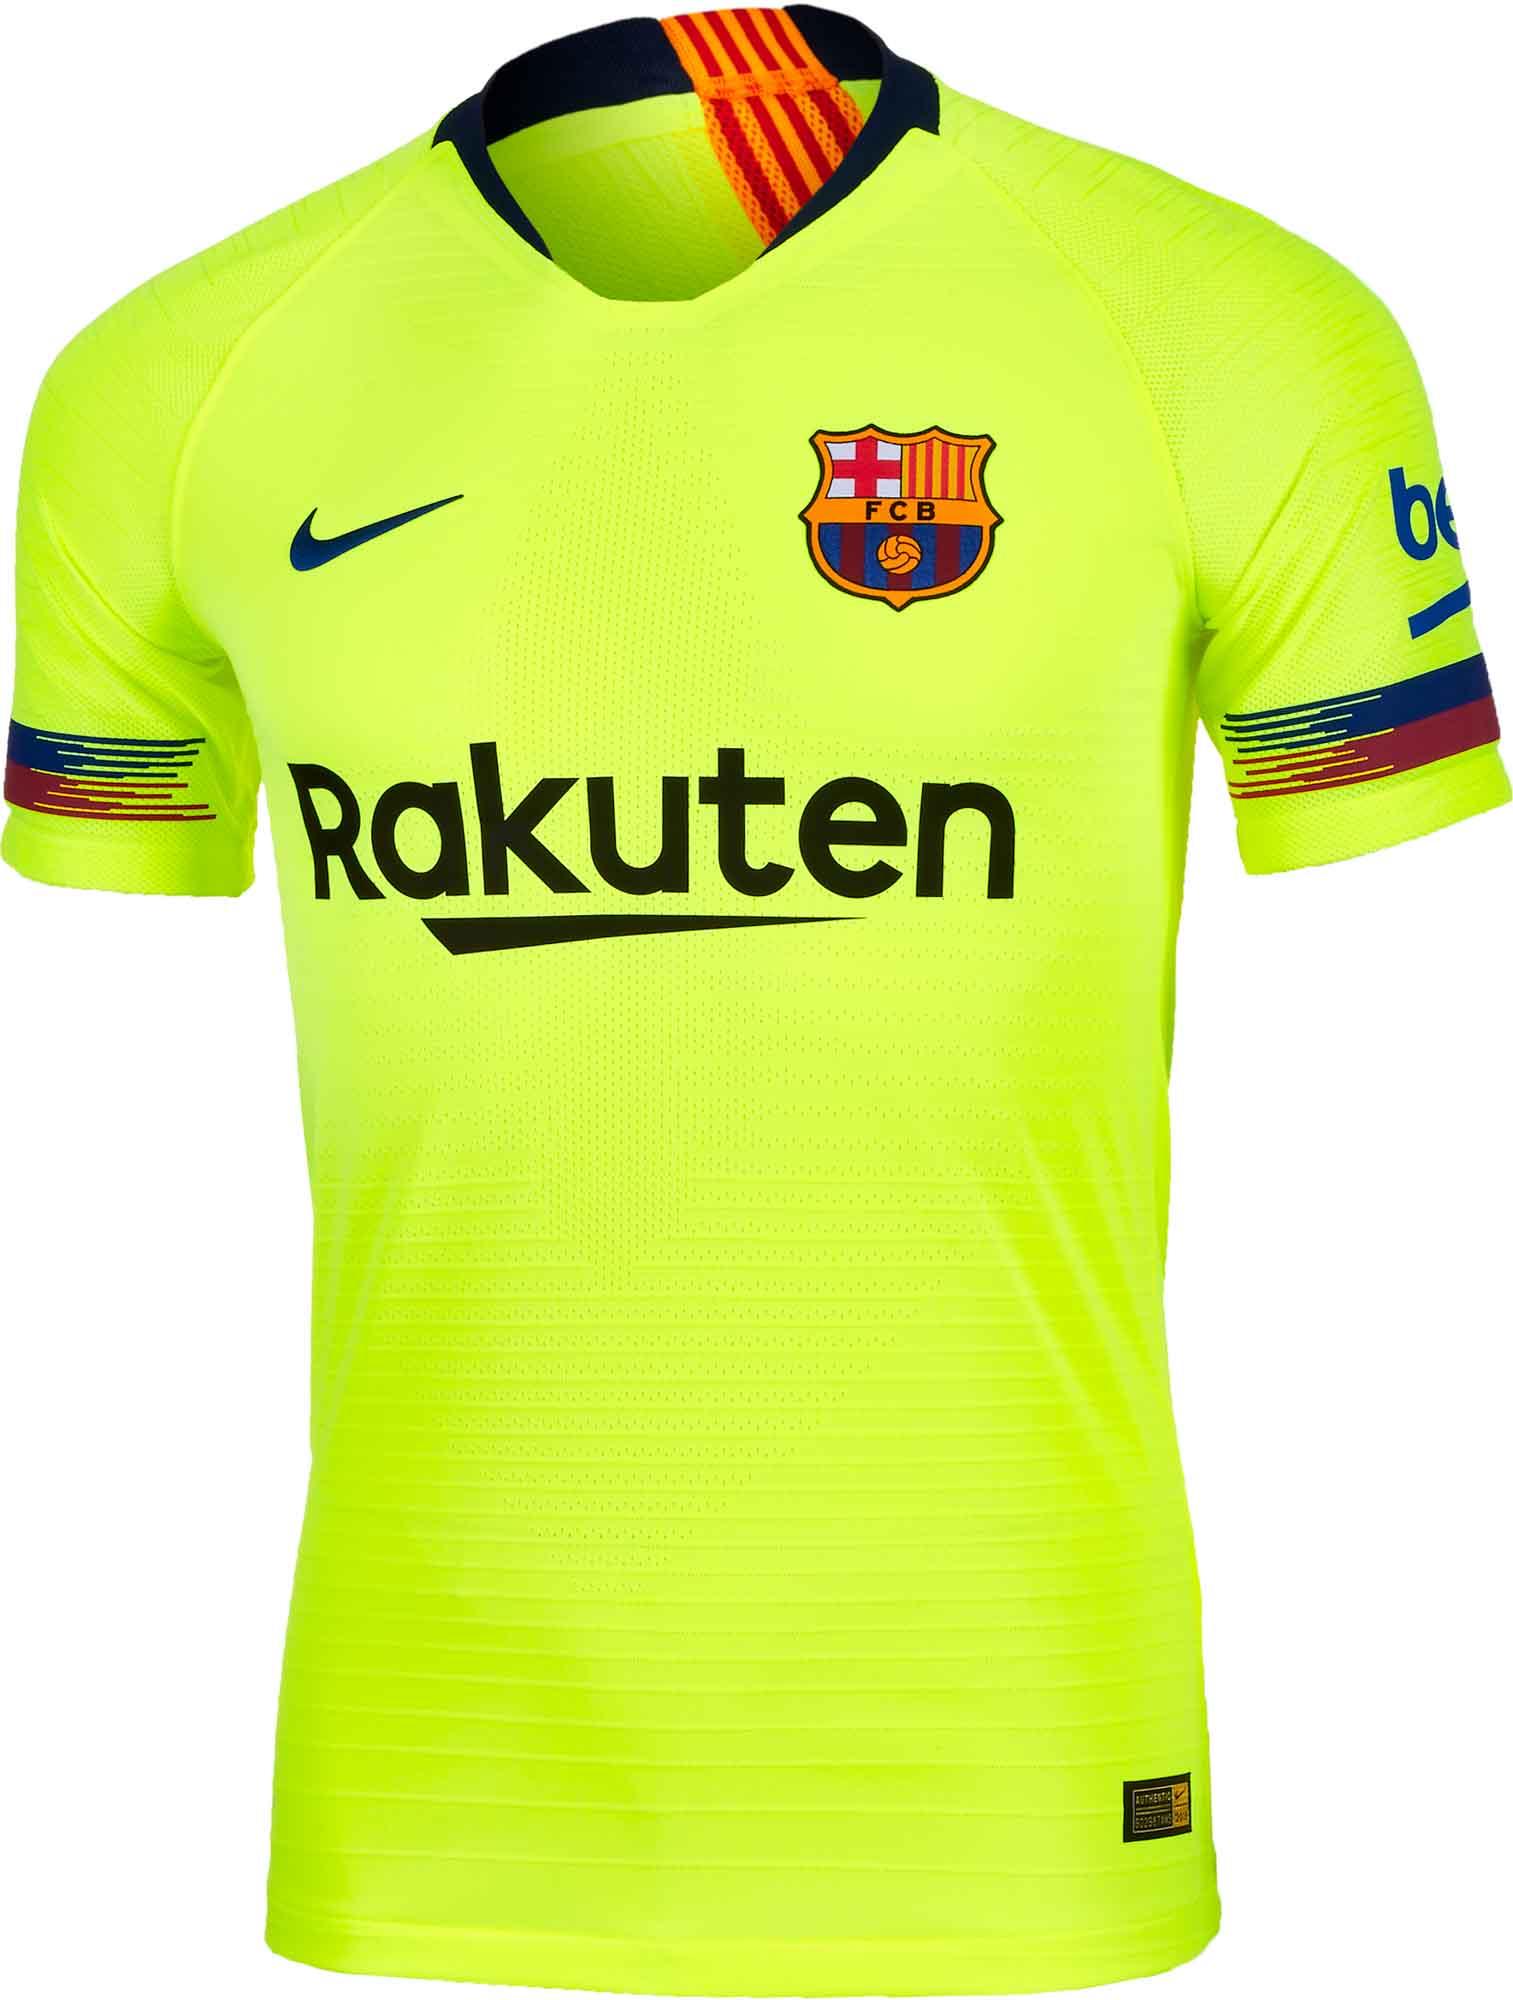 7209c0caf 2018 19 Nike Barcelona Away Match Jersey - Soccer Master